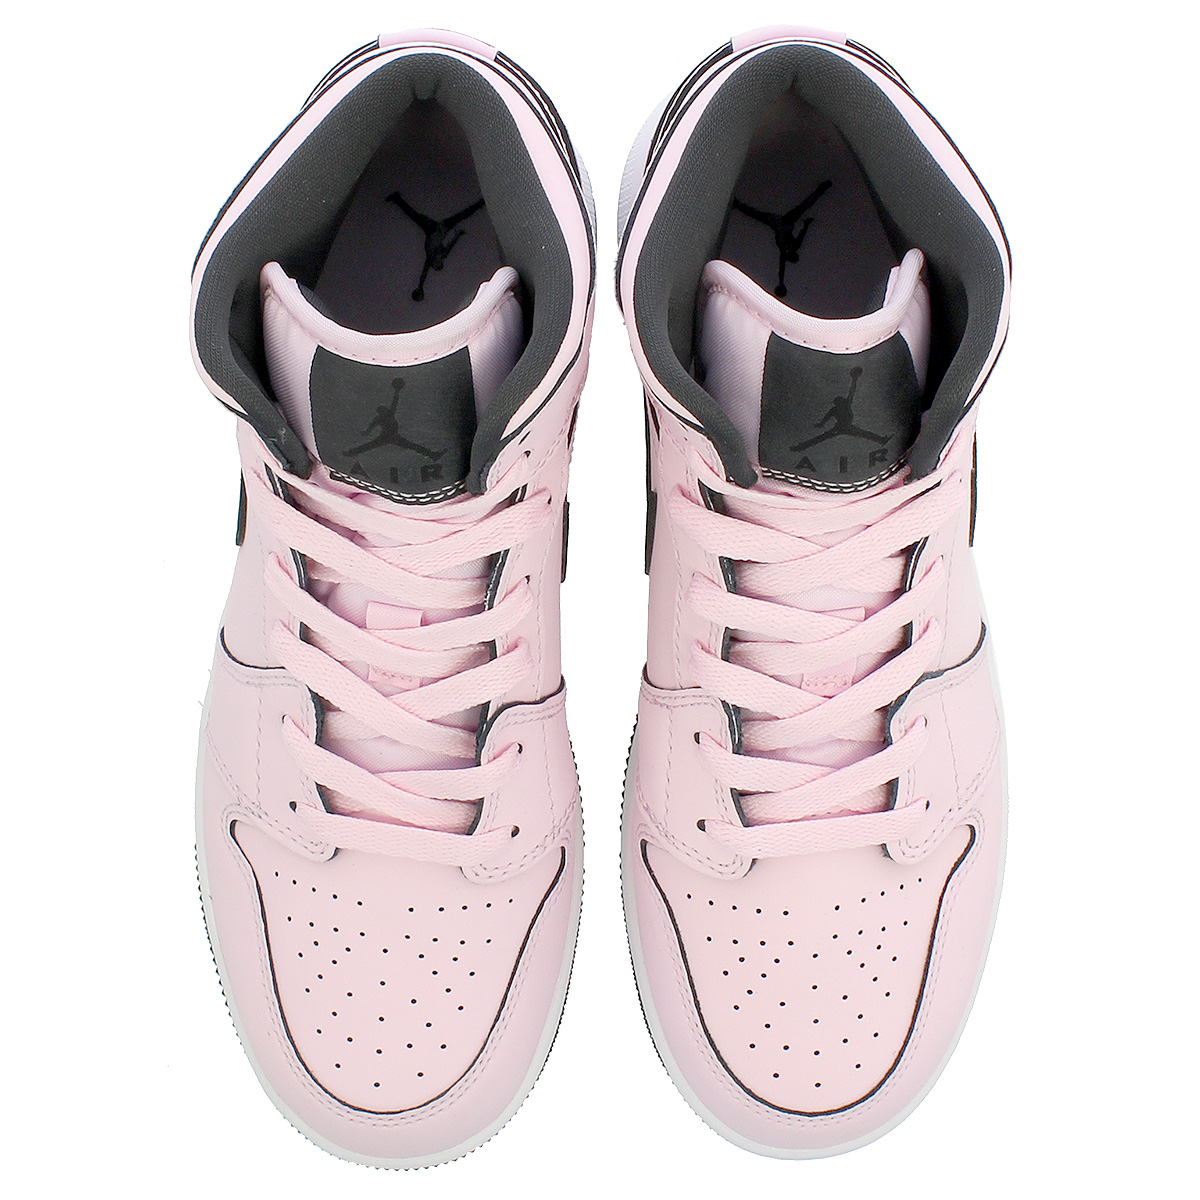 14c9dcf7e110c6 NIKE AIR JORDAN 1 MID GS Nike Air Jordan 1 mid GS PINK FOAM BLACK WHITE  555